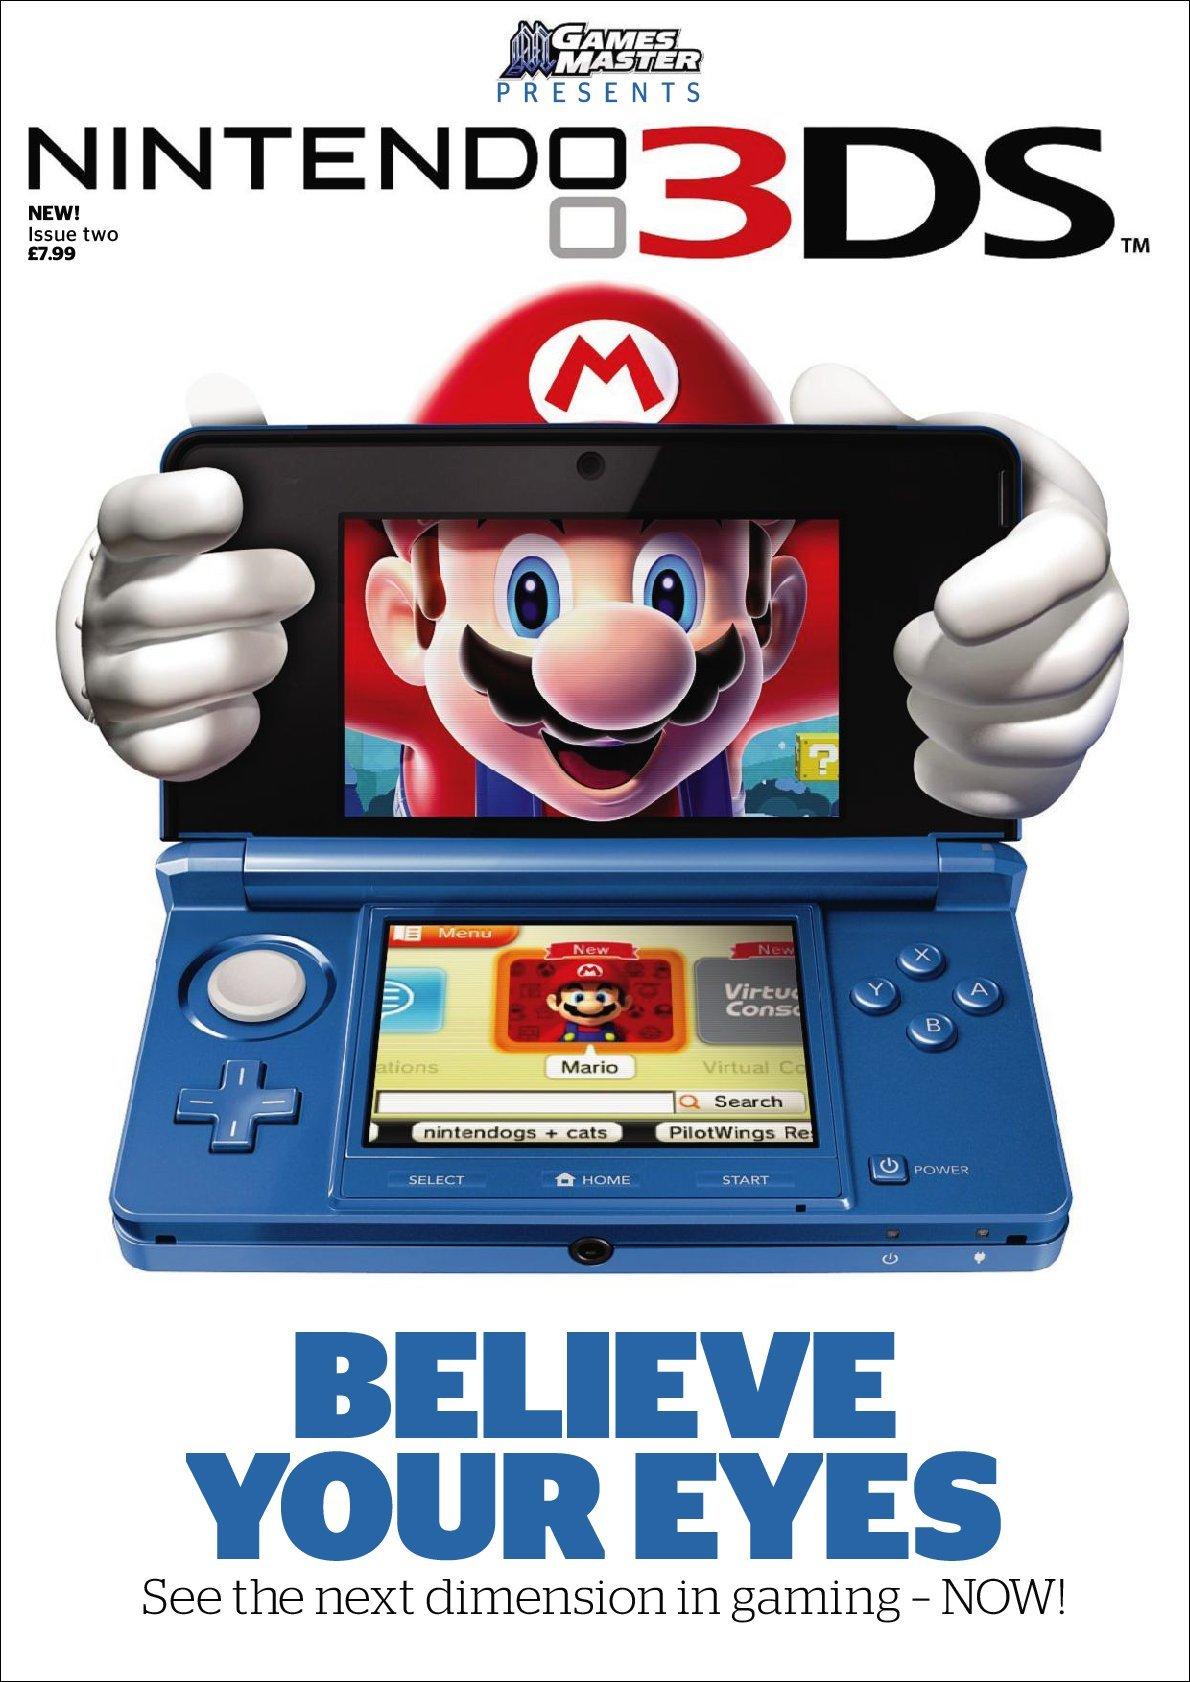 GamesMaster Presents Nintendo 3DS Digital